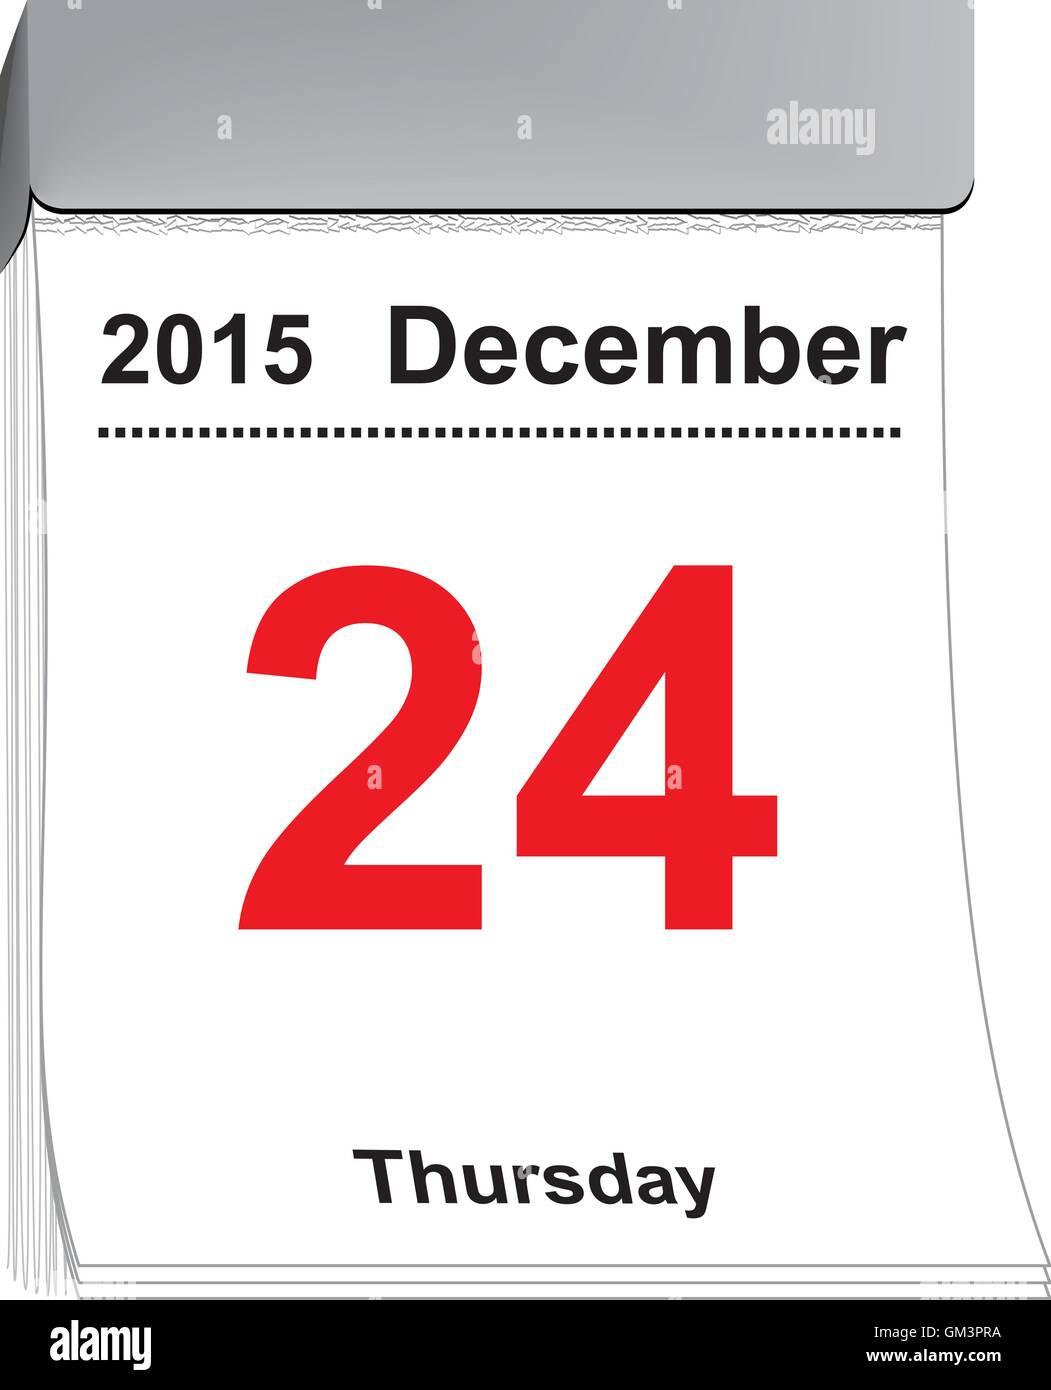 Tear off calendar December 24, 2015 - Stock Image